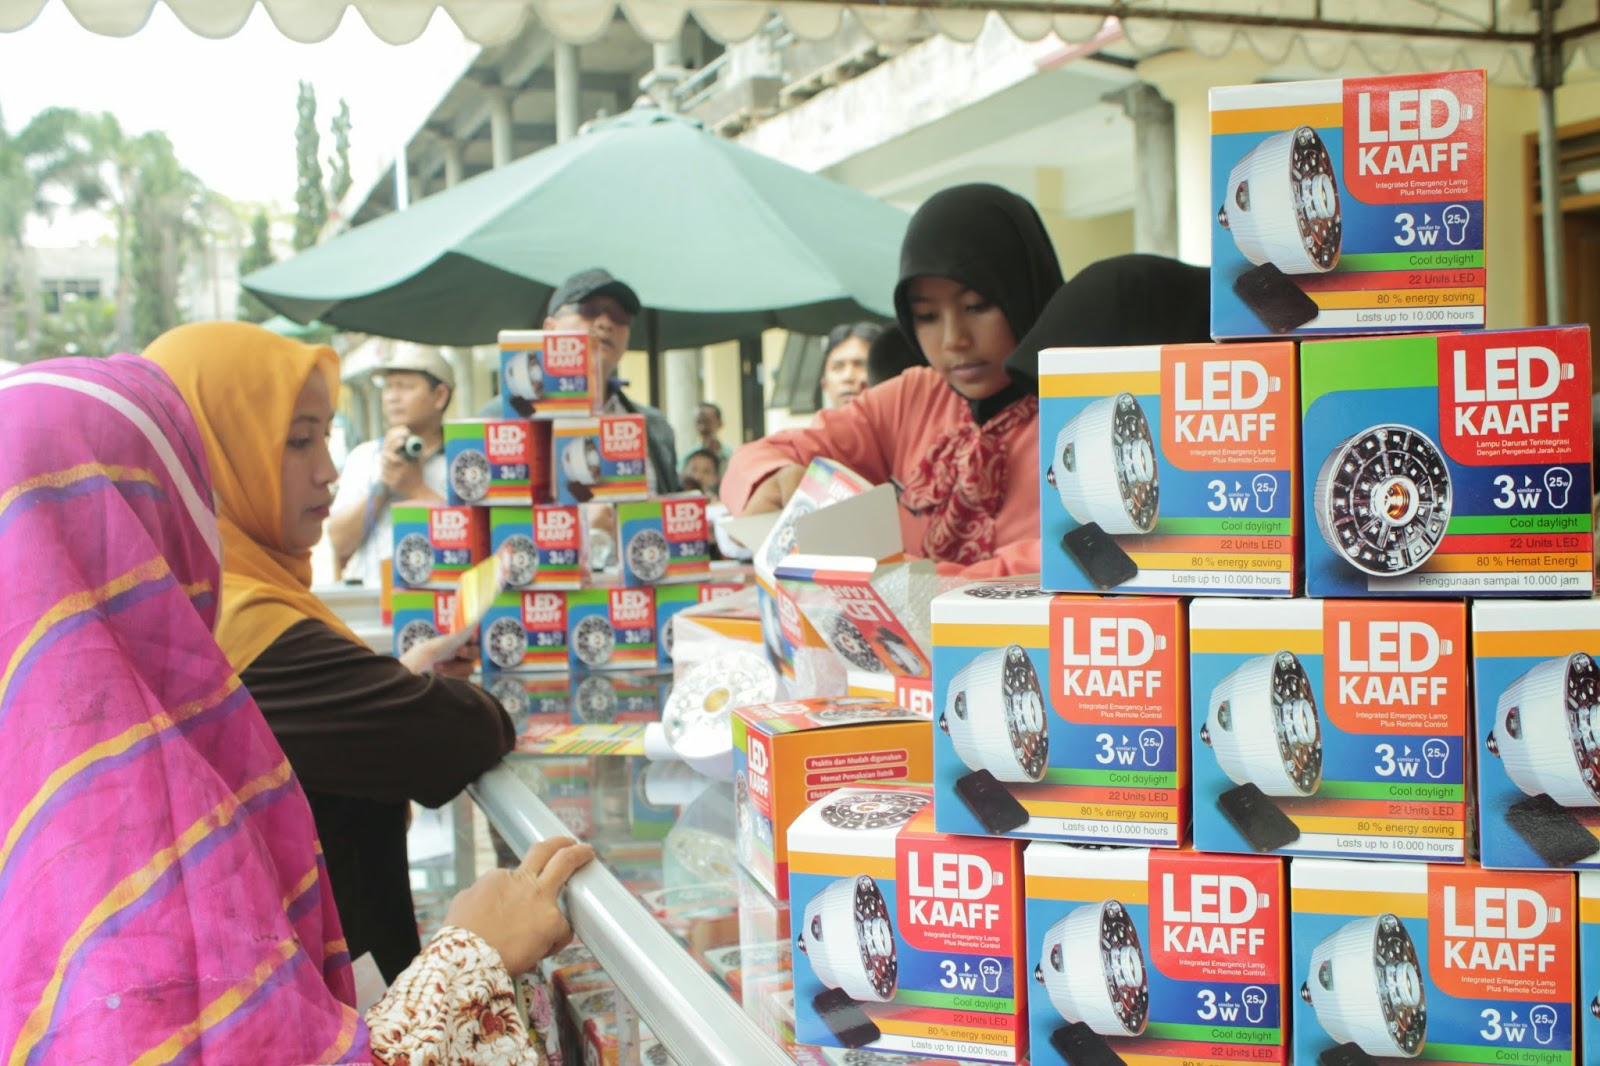 Knowledge Cafe Of Smk Industri Al Kaaffah Hebat Pelajar Smk Ciptakan Lampu Led Hemat Energi